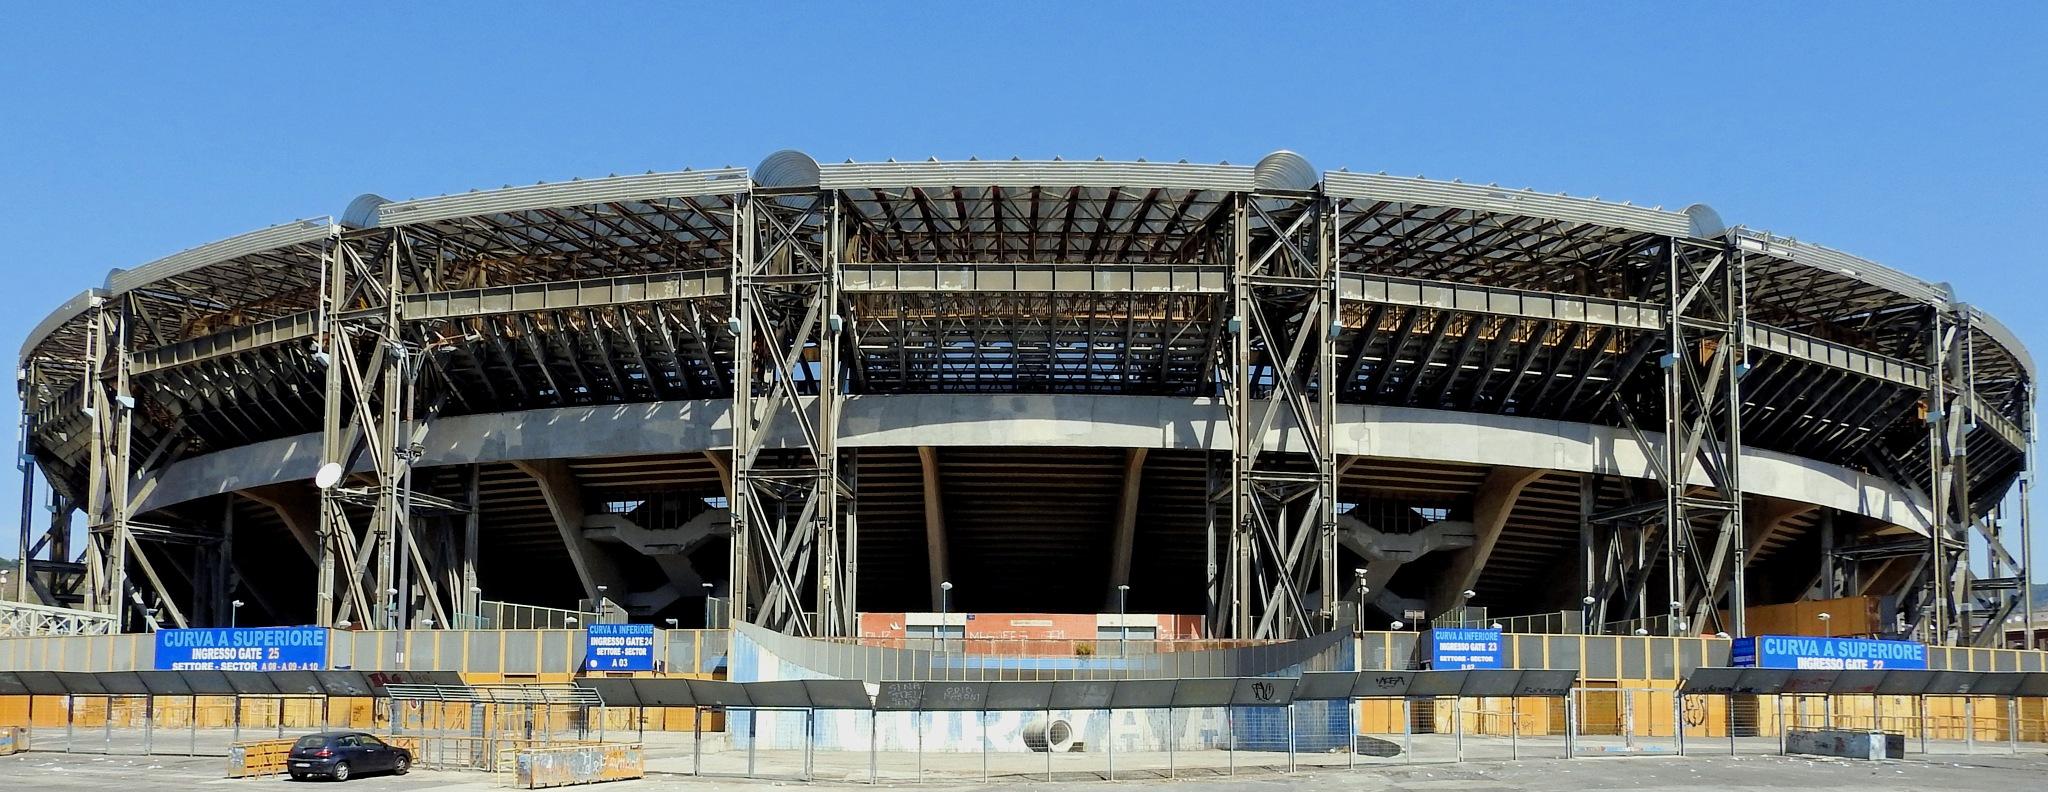 Napoli  - San Paolo Stadium The Naples Foot-Ball Club's Temple by Arnaldo De Lisio